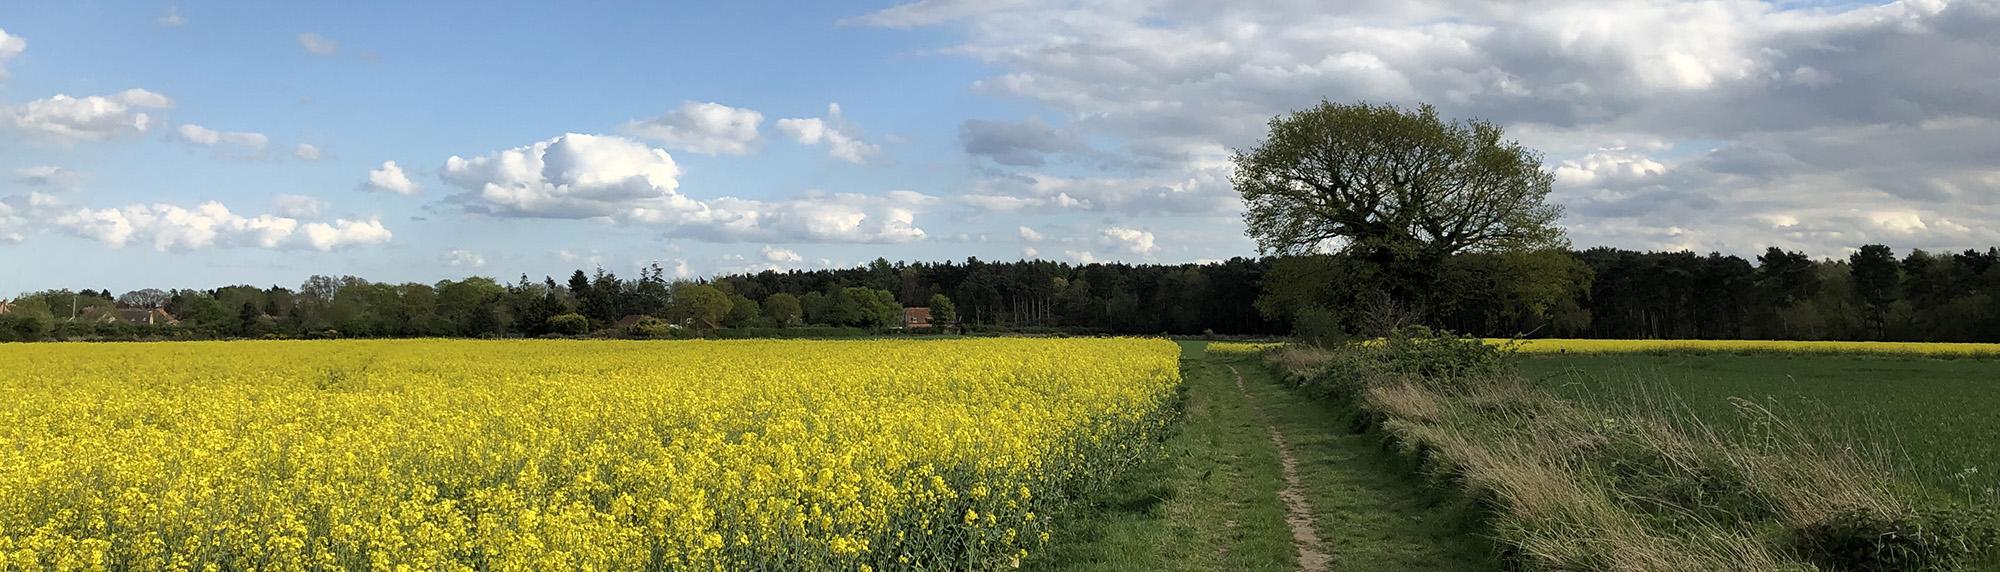 Briston countryside view